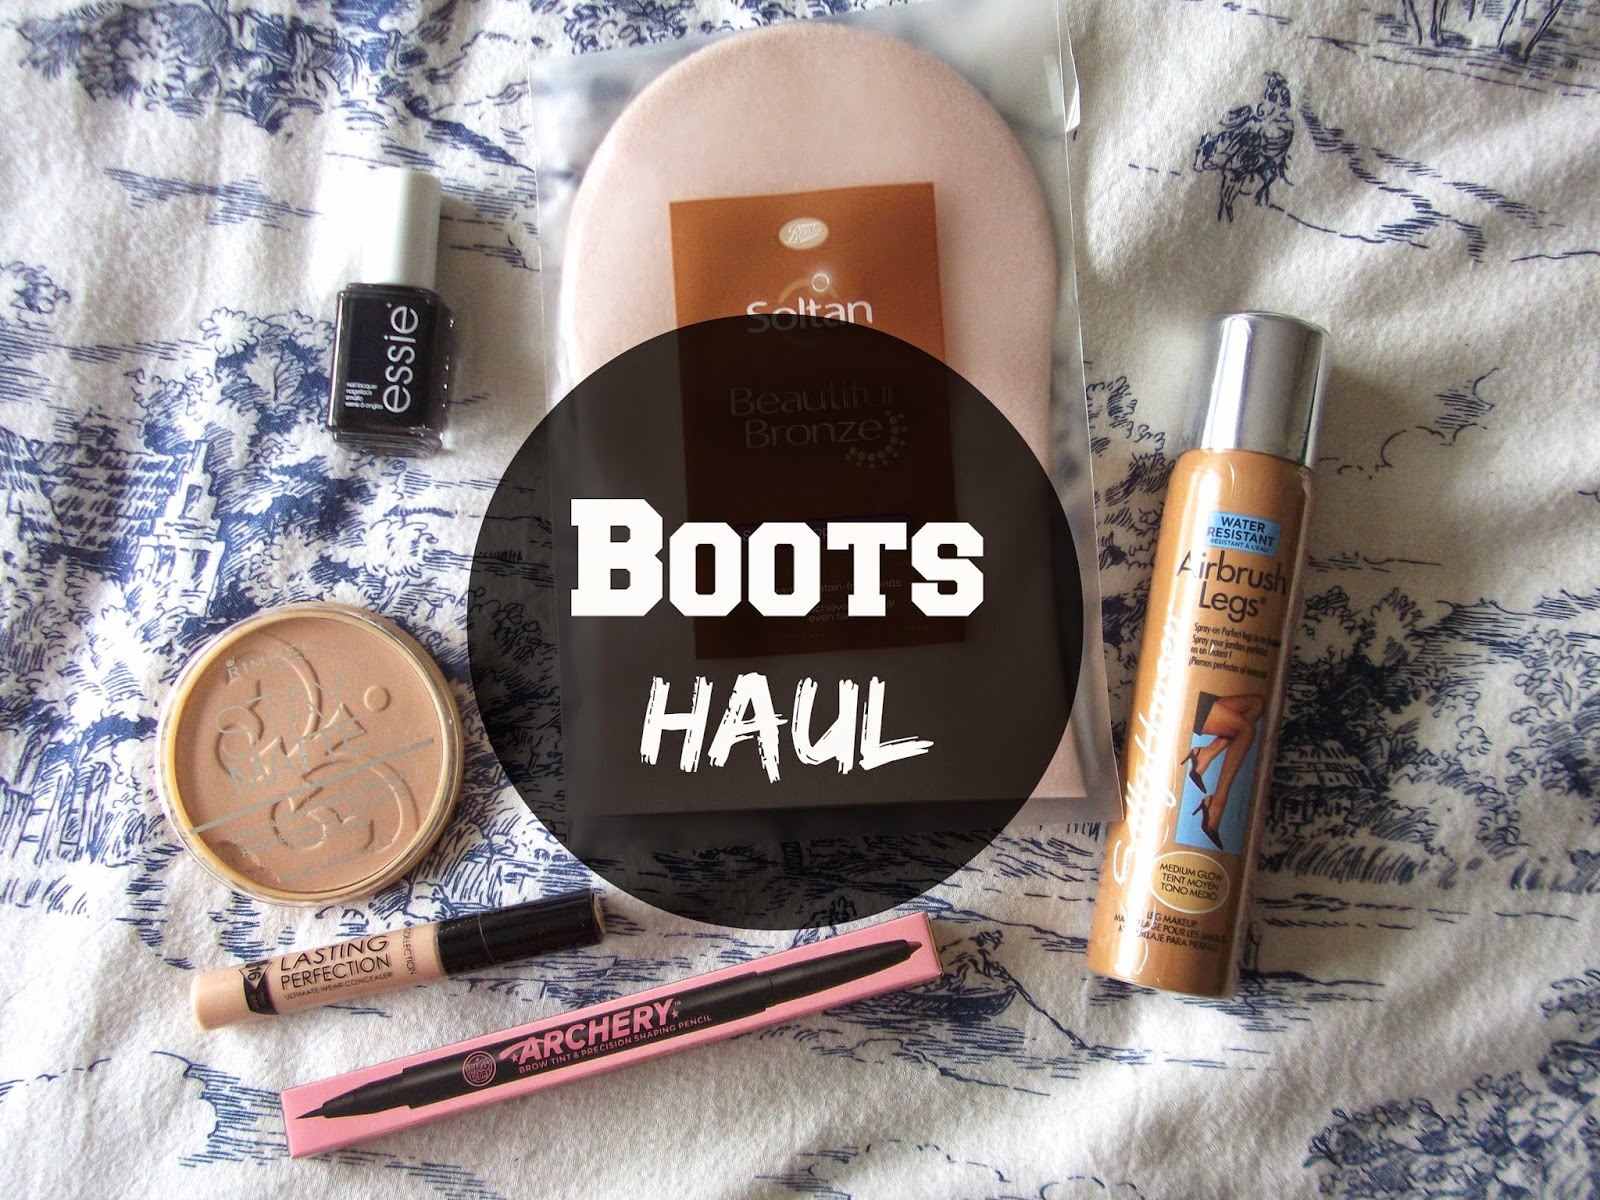 Boots Haul